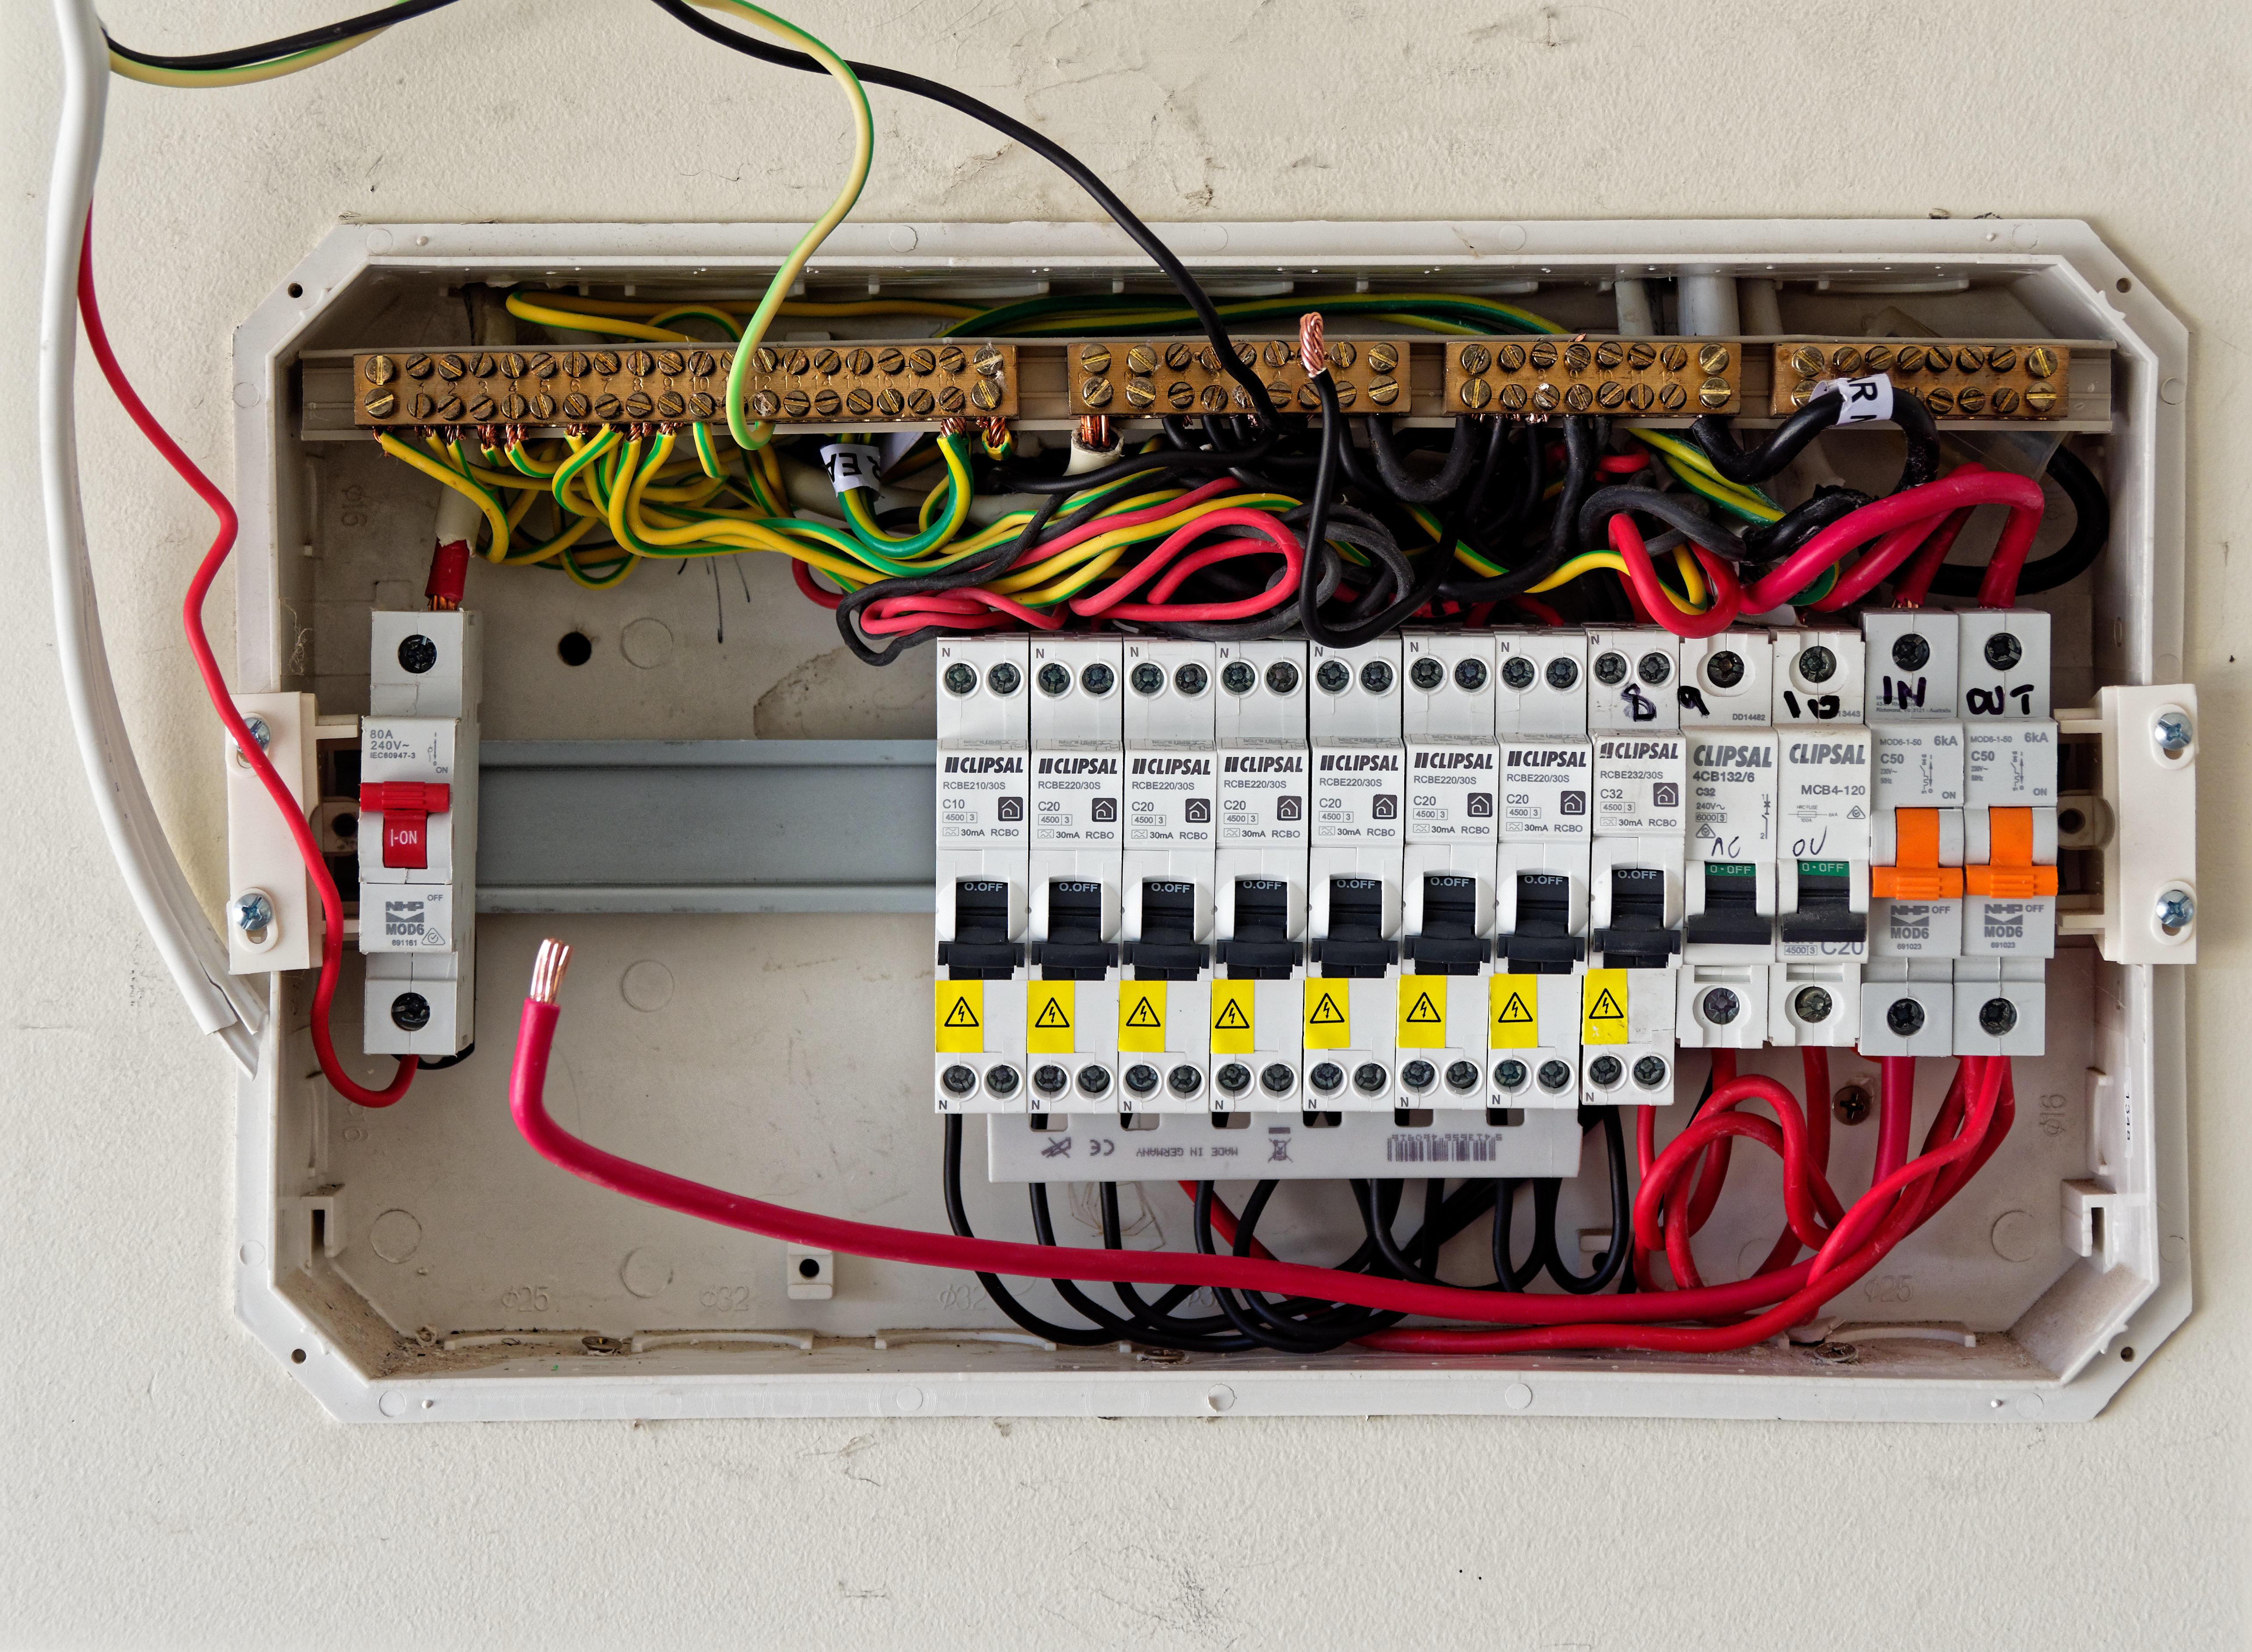 Rewiring-13.jpeg